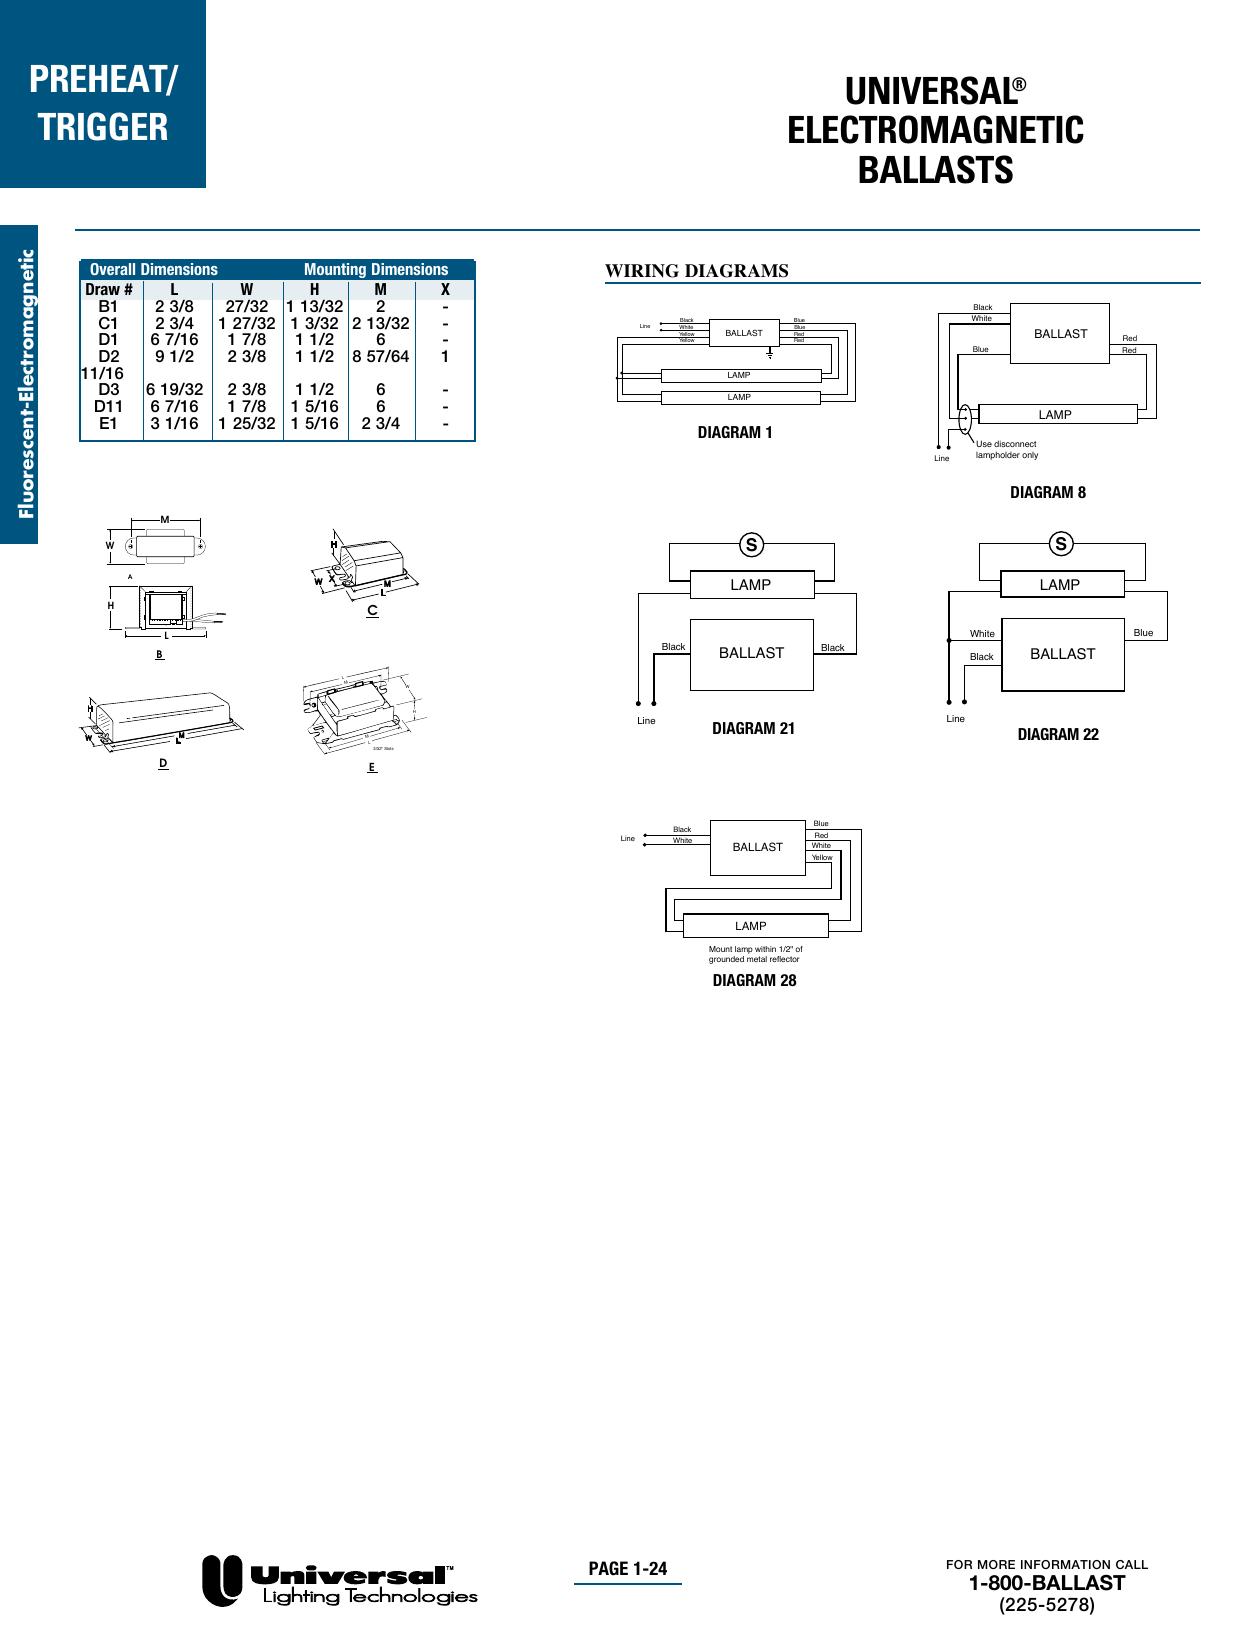 Schwabe 70w Metal Halide Electronic Ballast M7012 27ck5eujt3